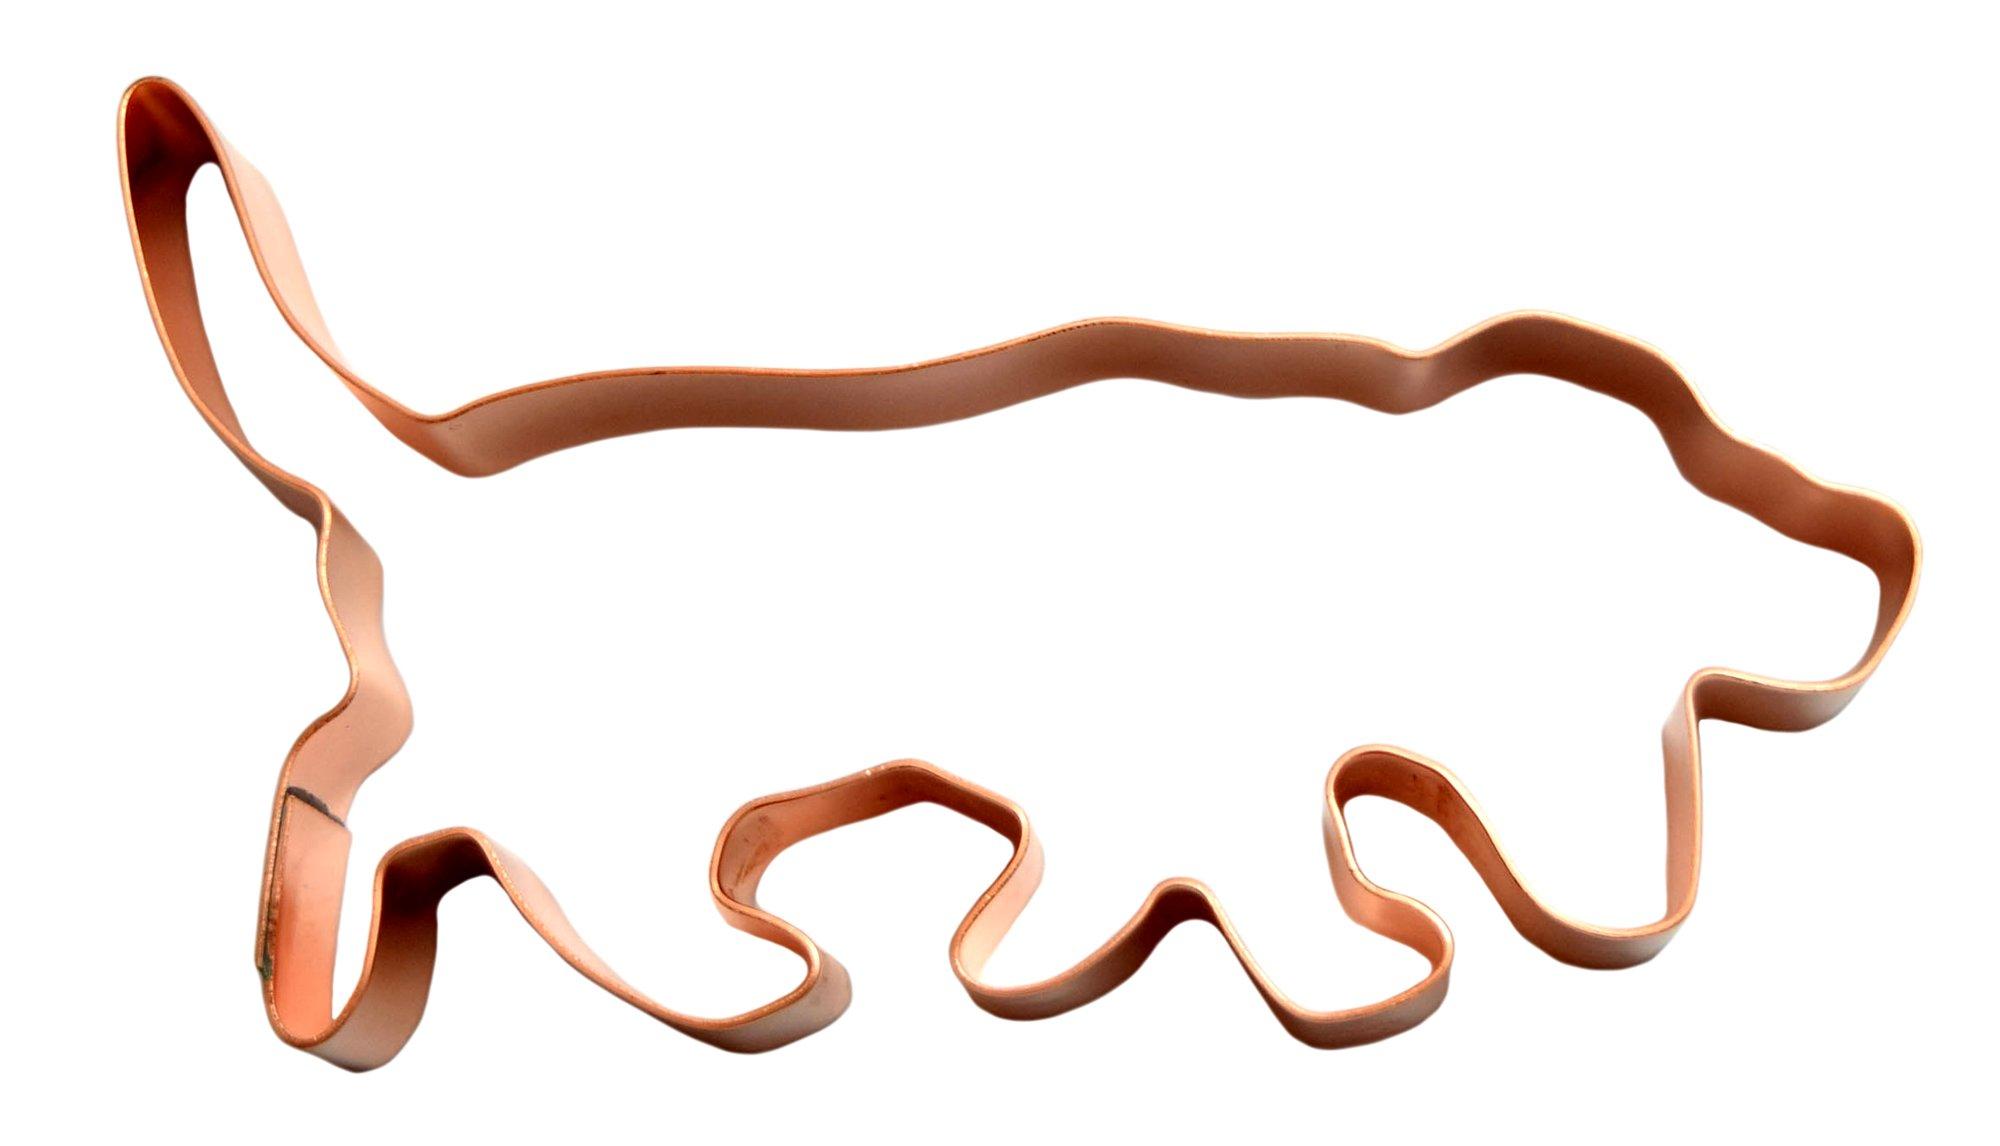 Hunting Basset Hound Copper Cookie Cutter 1